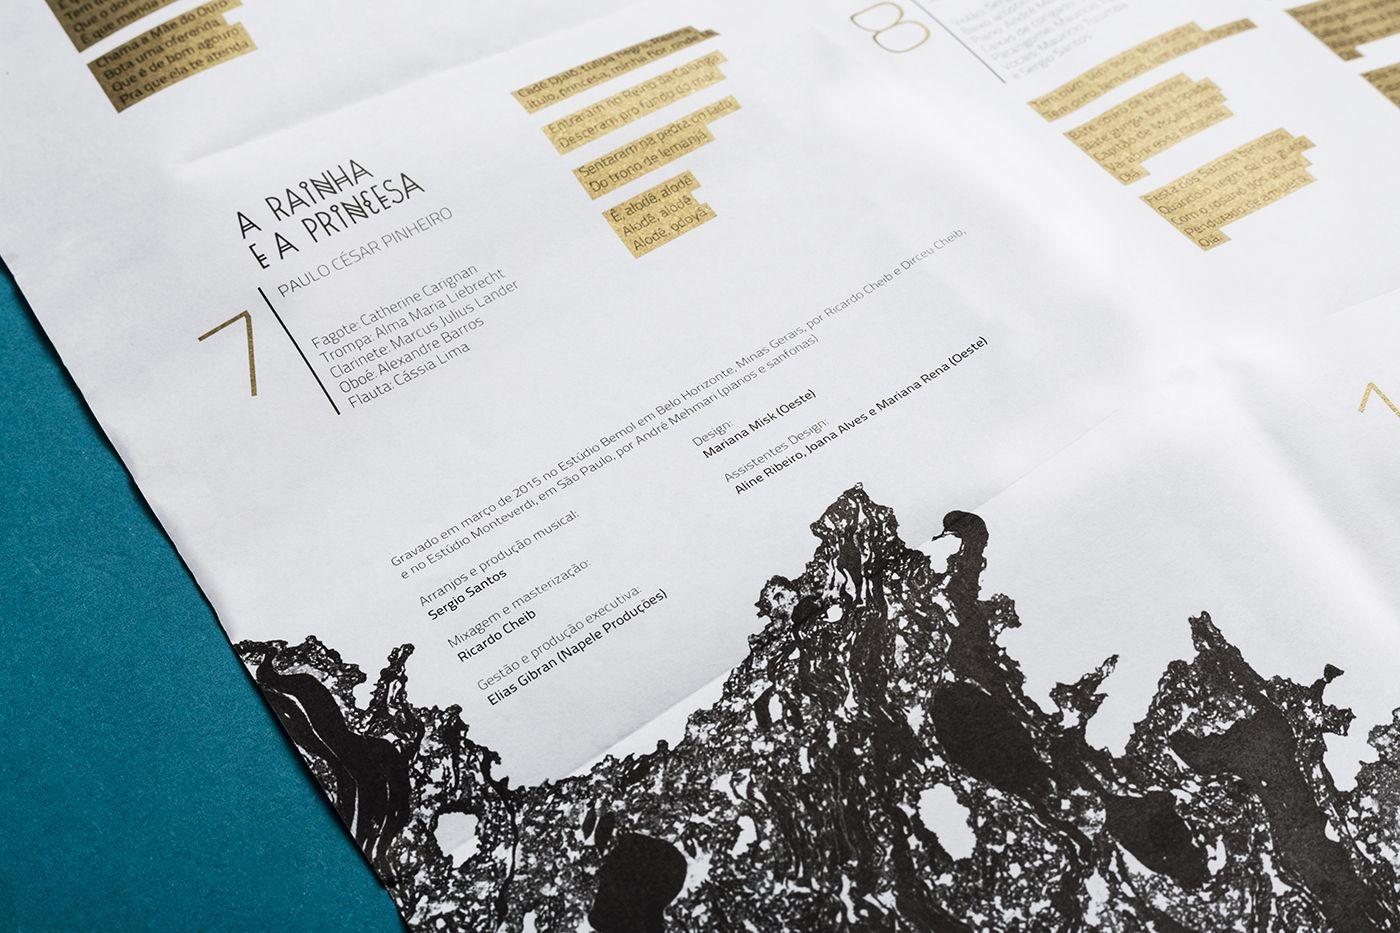 Galanga Chico Rei - Promocional |  Cliente: Mauricio Tizumba - 2015 - promotional design | Client: Mauricio Tizumba - 2015 - Oeste: oeste.art.br